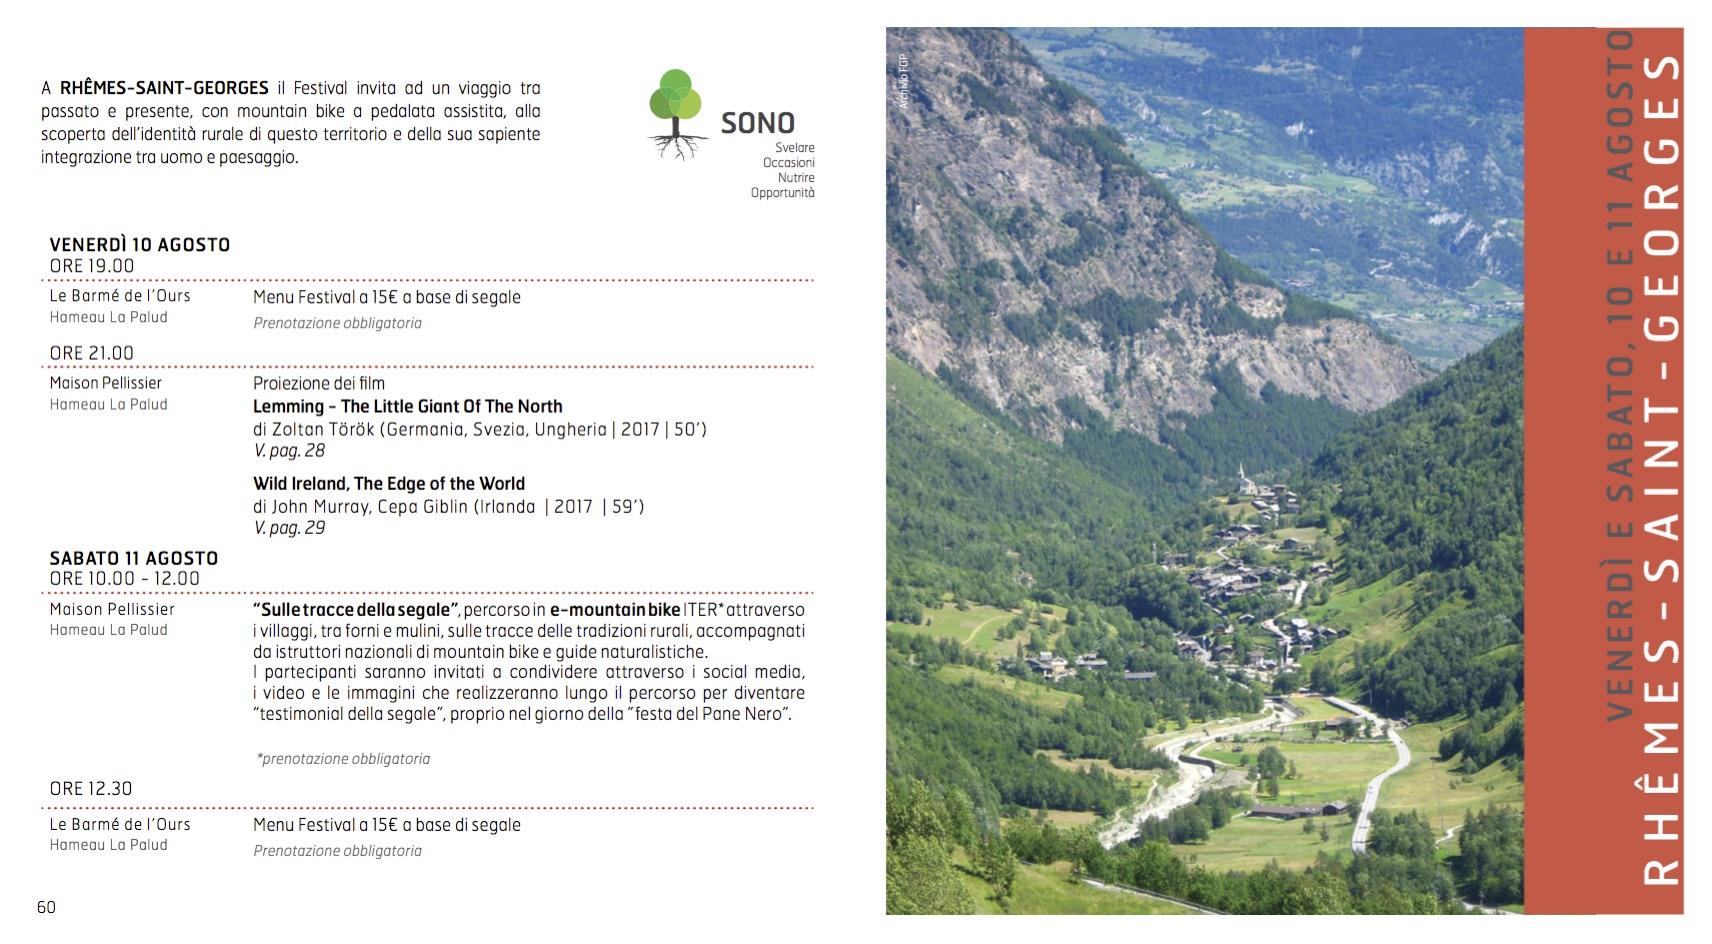 GPFF21 Programma Rhemes-Saint-Georges